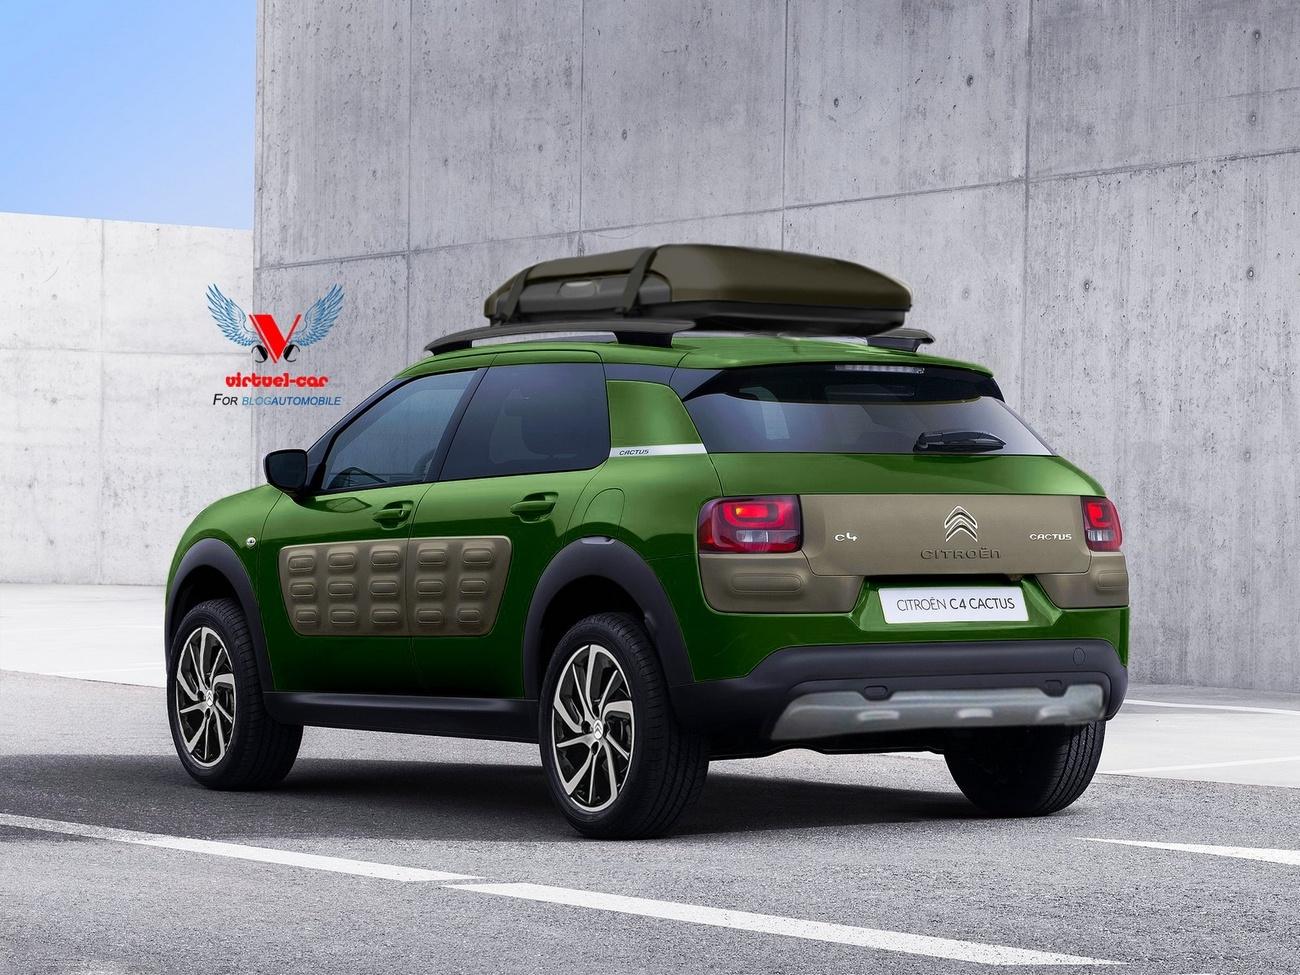 citro n c4 cactus cross aventure blog automobile. Black Bedroom Furniture Sets. Home Design Ideas